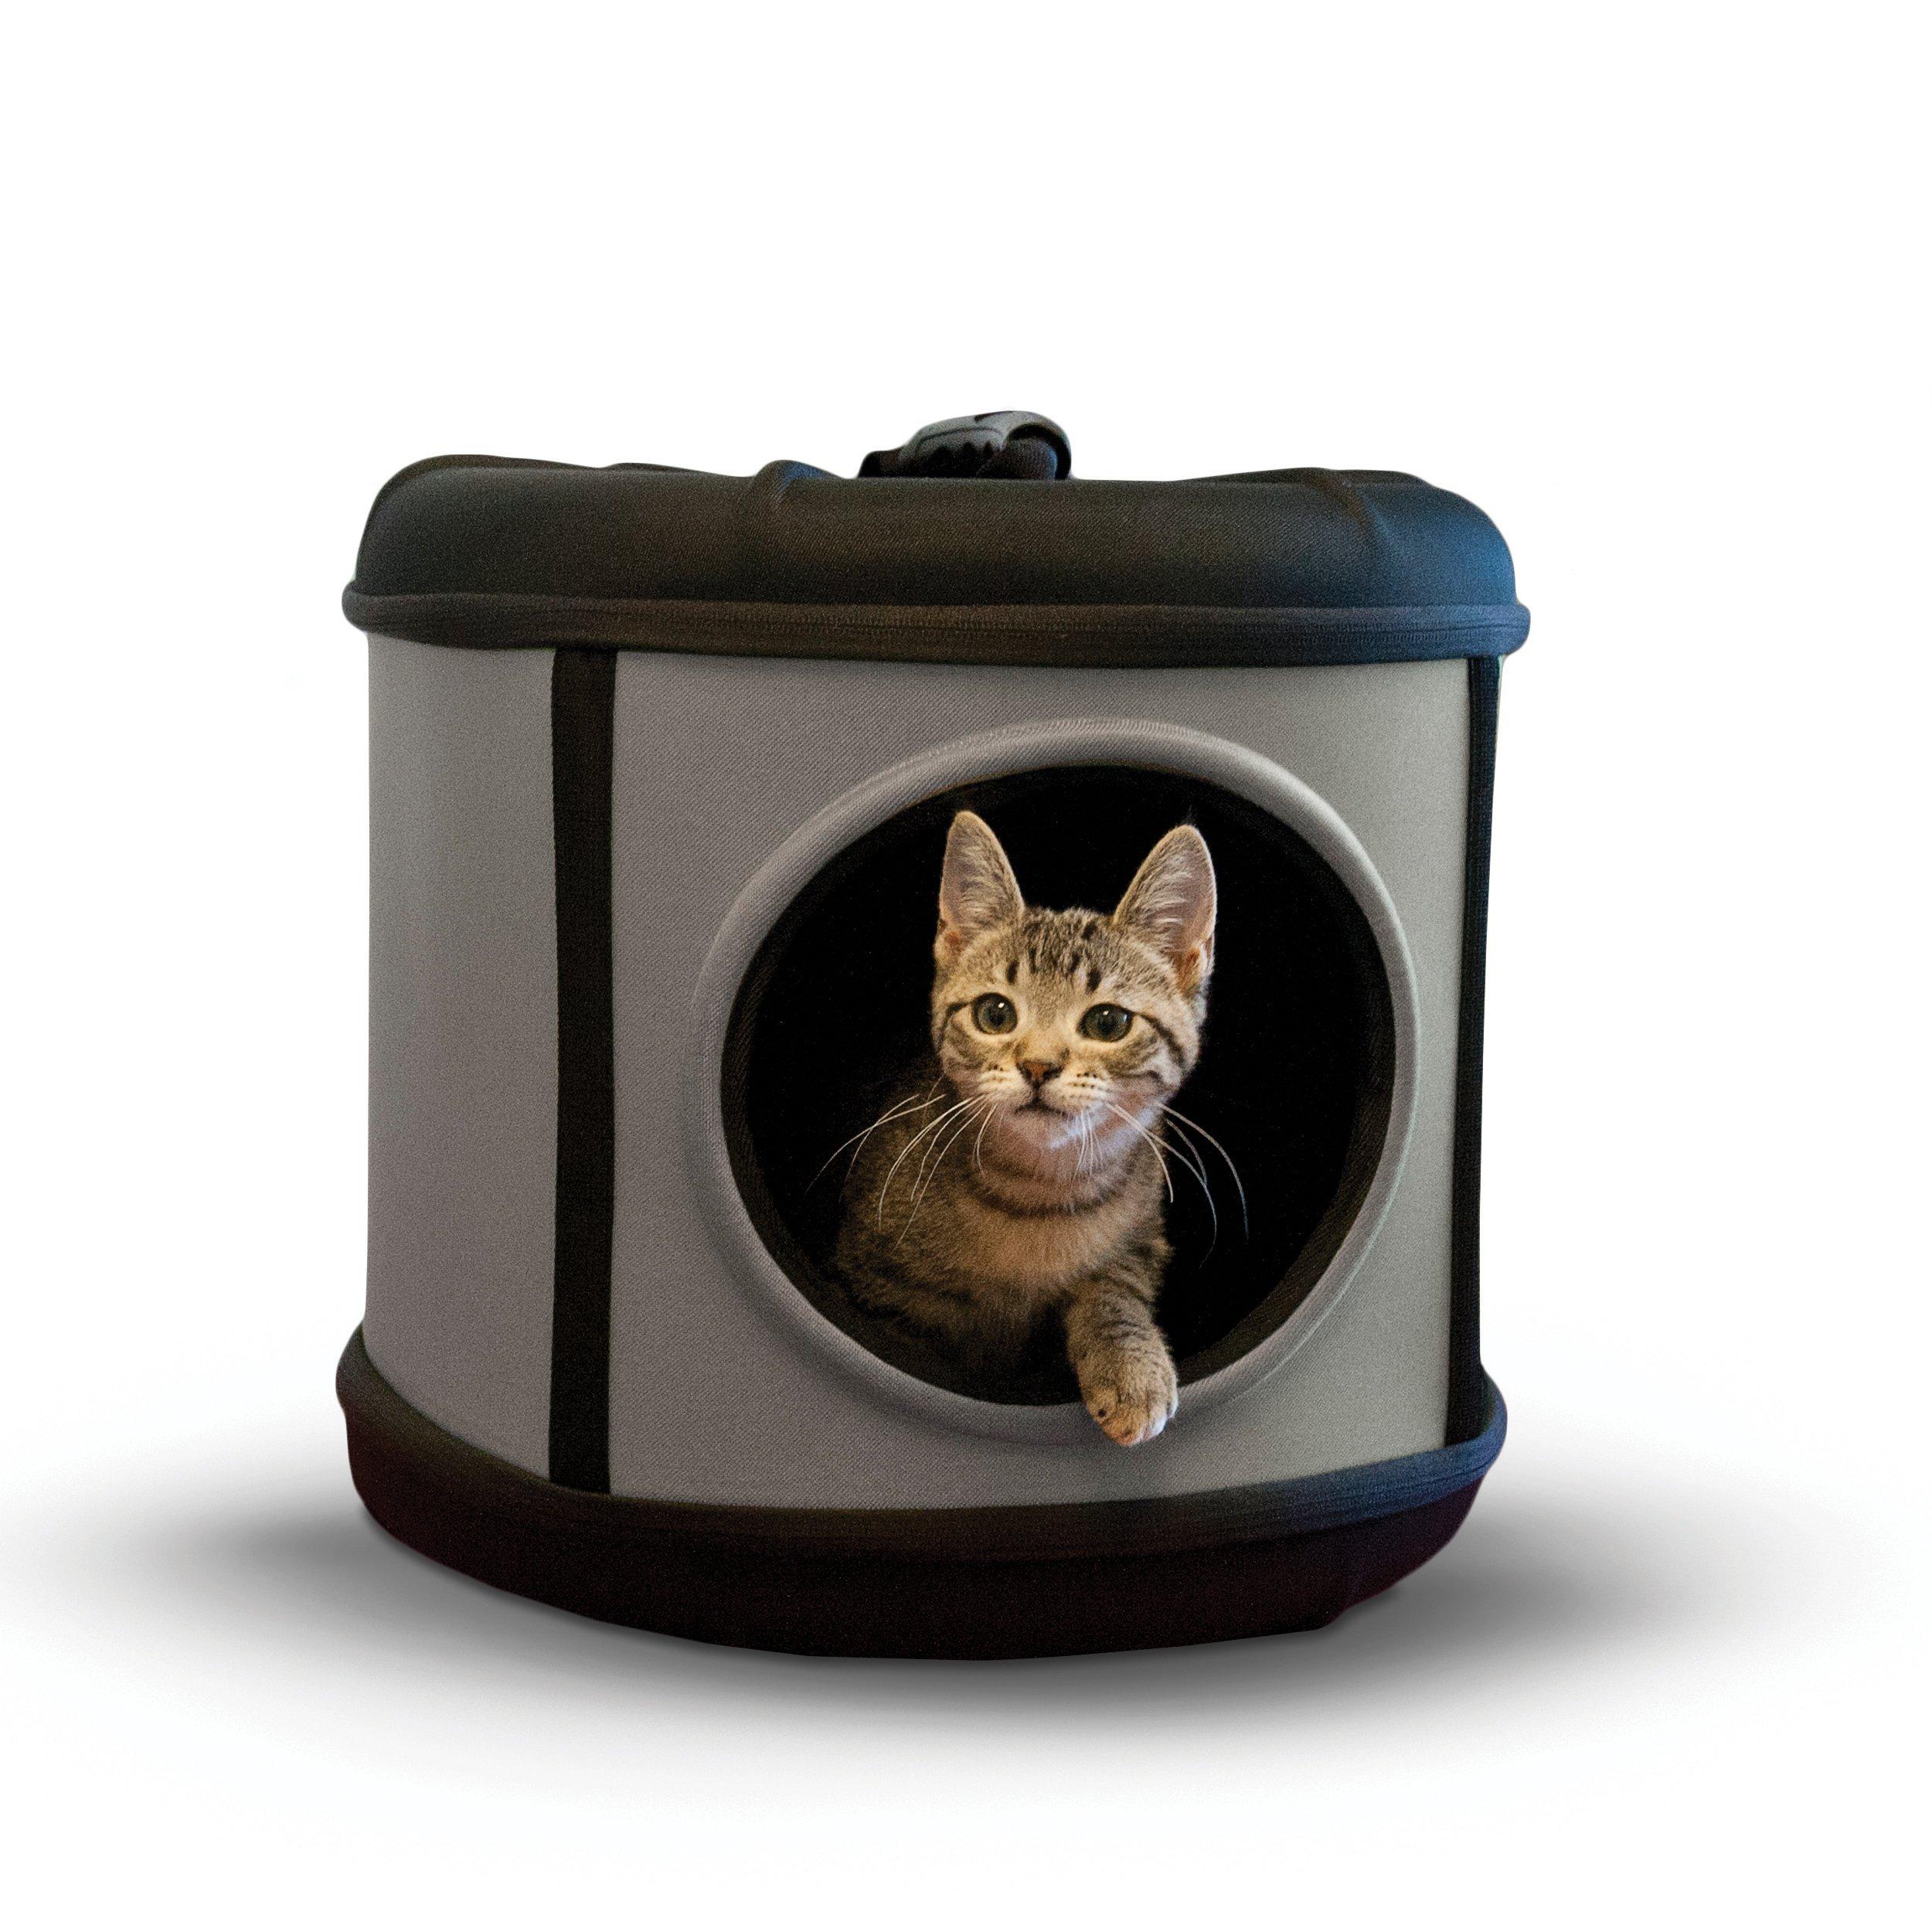 K&H Pet Products Mod Capsule Pet Carrier & Shelter Gray/Black 17'' x 17'' x 15.5''